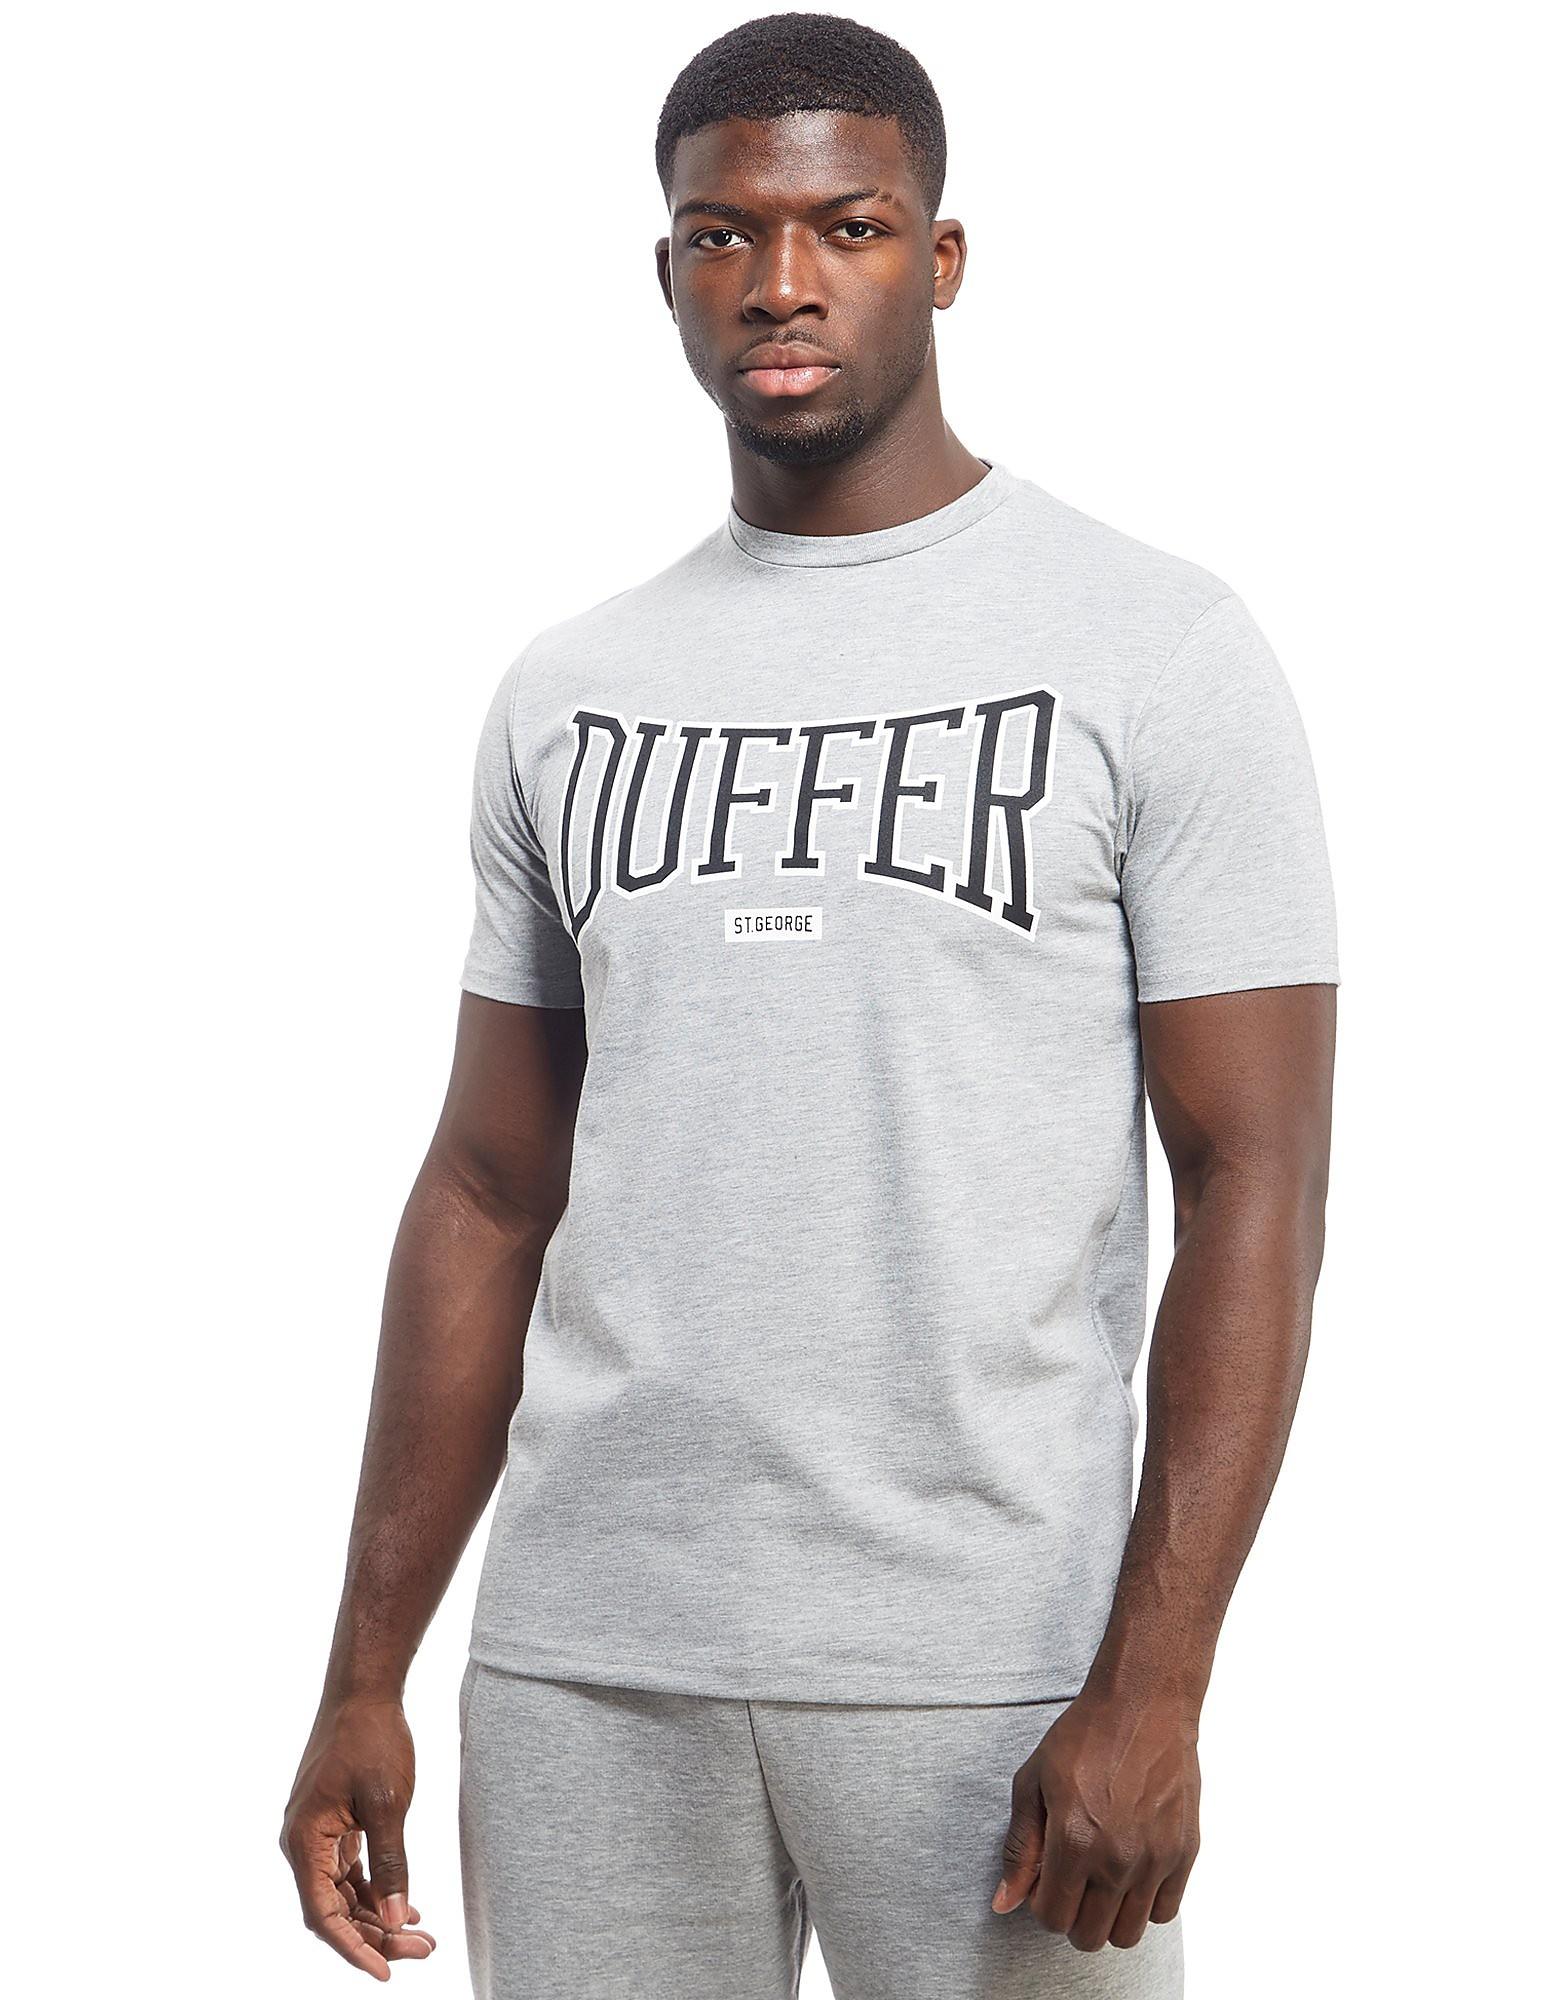 Duffer of St George camiseta Blenheim